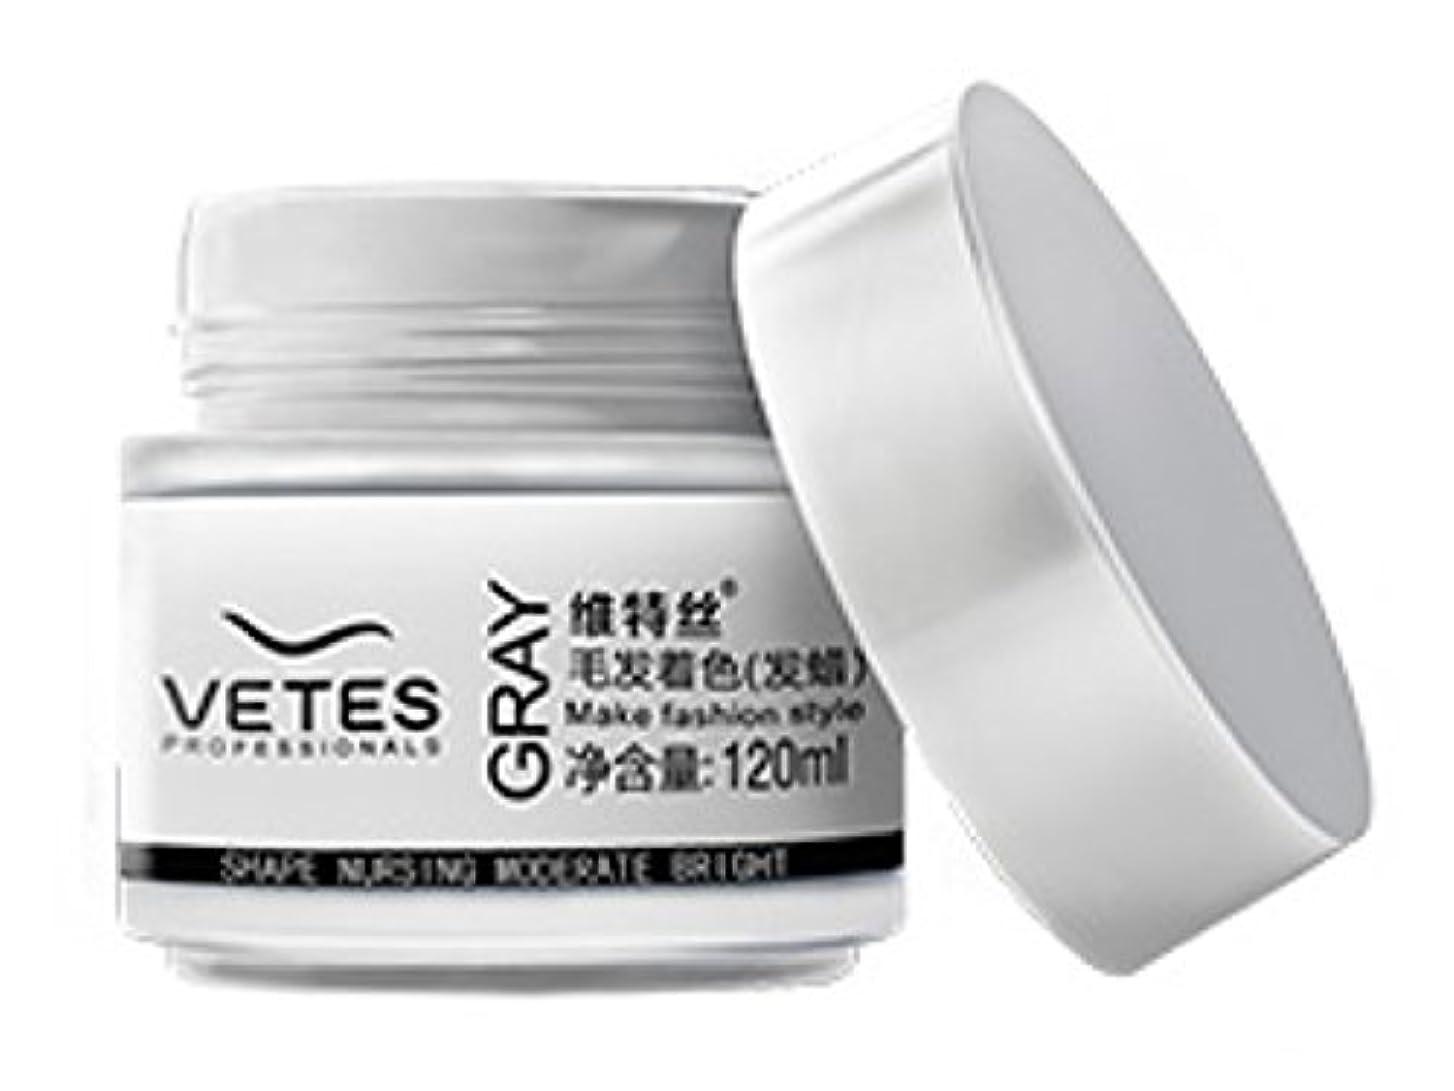 BEAUTY VEIL ヘアカラーワックス 6色 高彩度 大容量 120g ヘアスタイリング オシャレ染め (ホワイトグレイ)